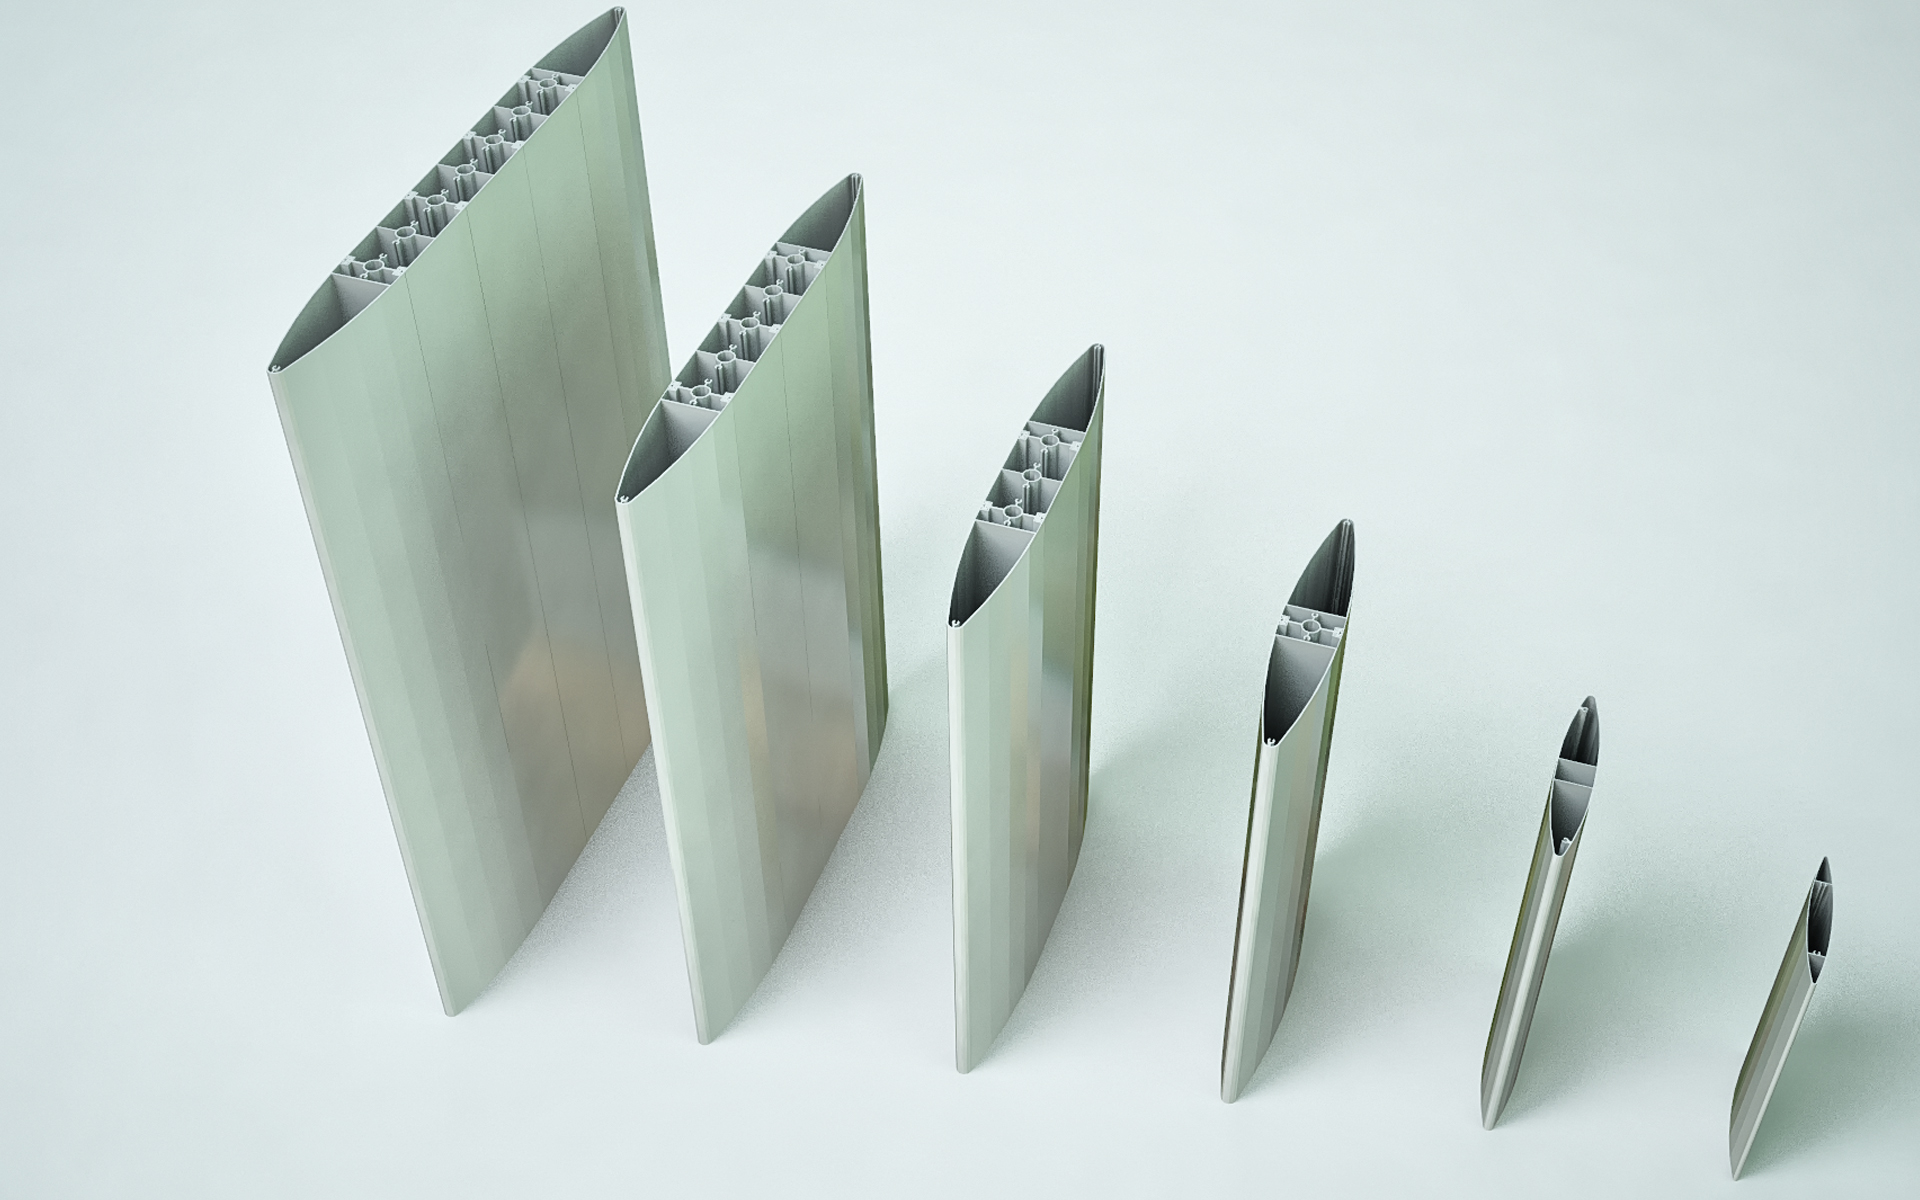 tipologia_frangisole_orientabile_pale_telai_alluminio_Stameat_srl-Padova